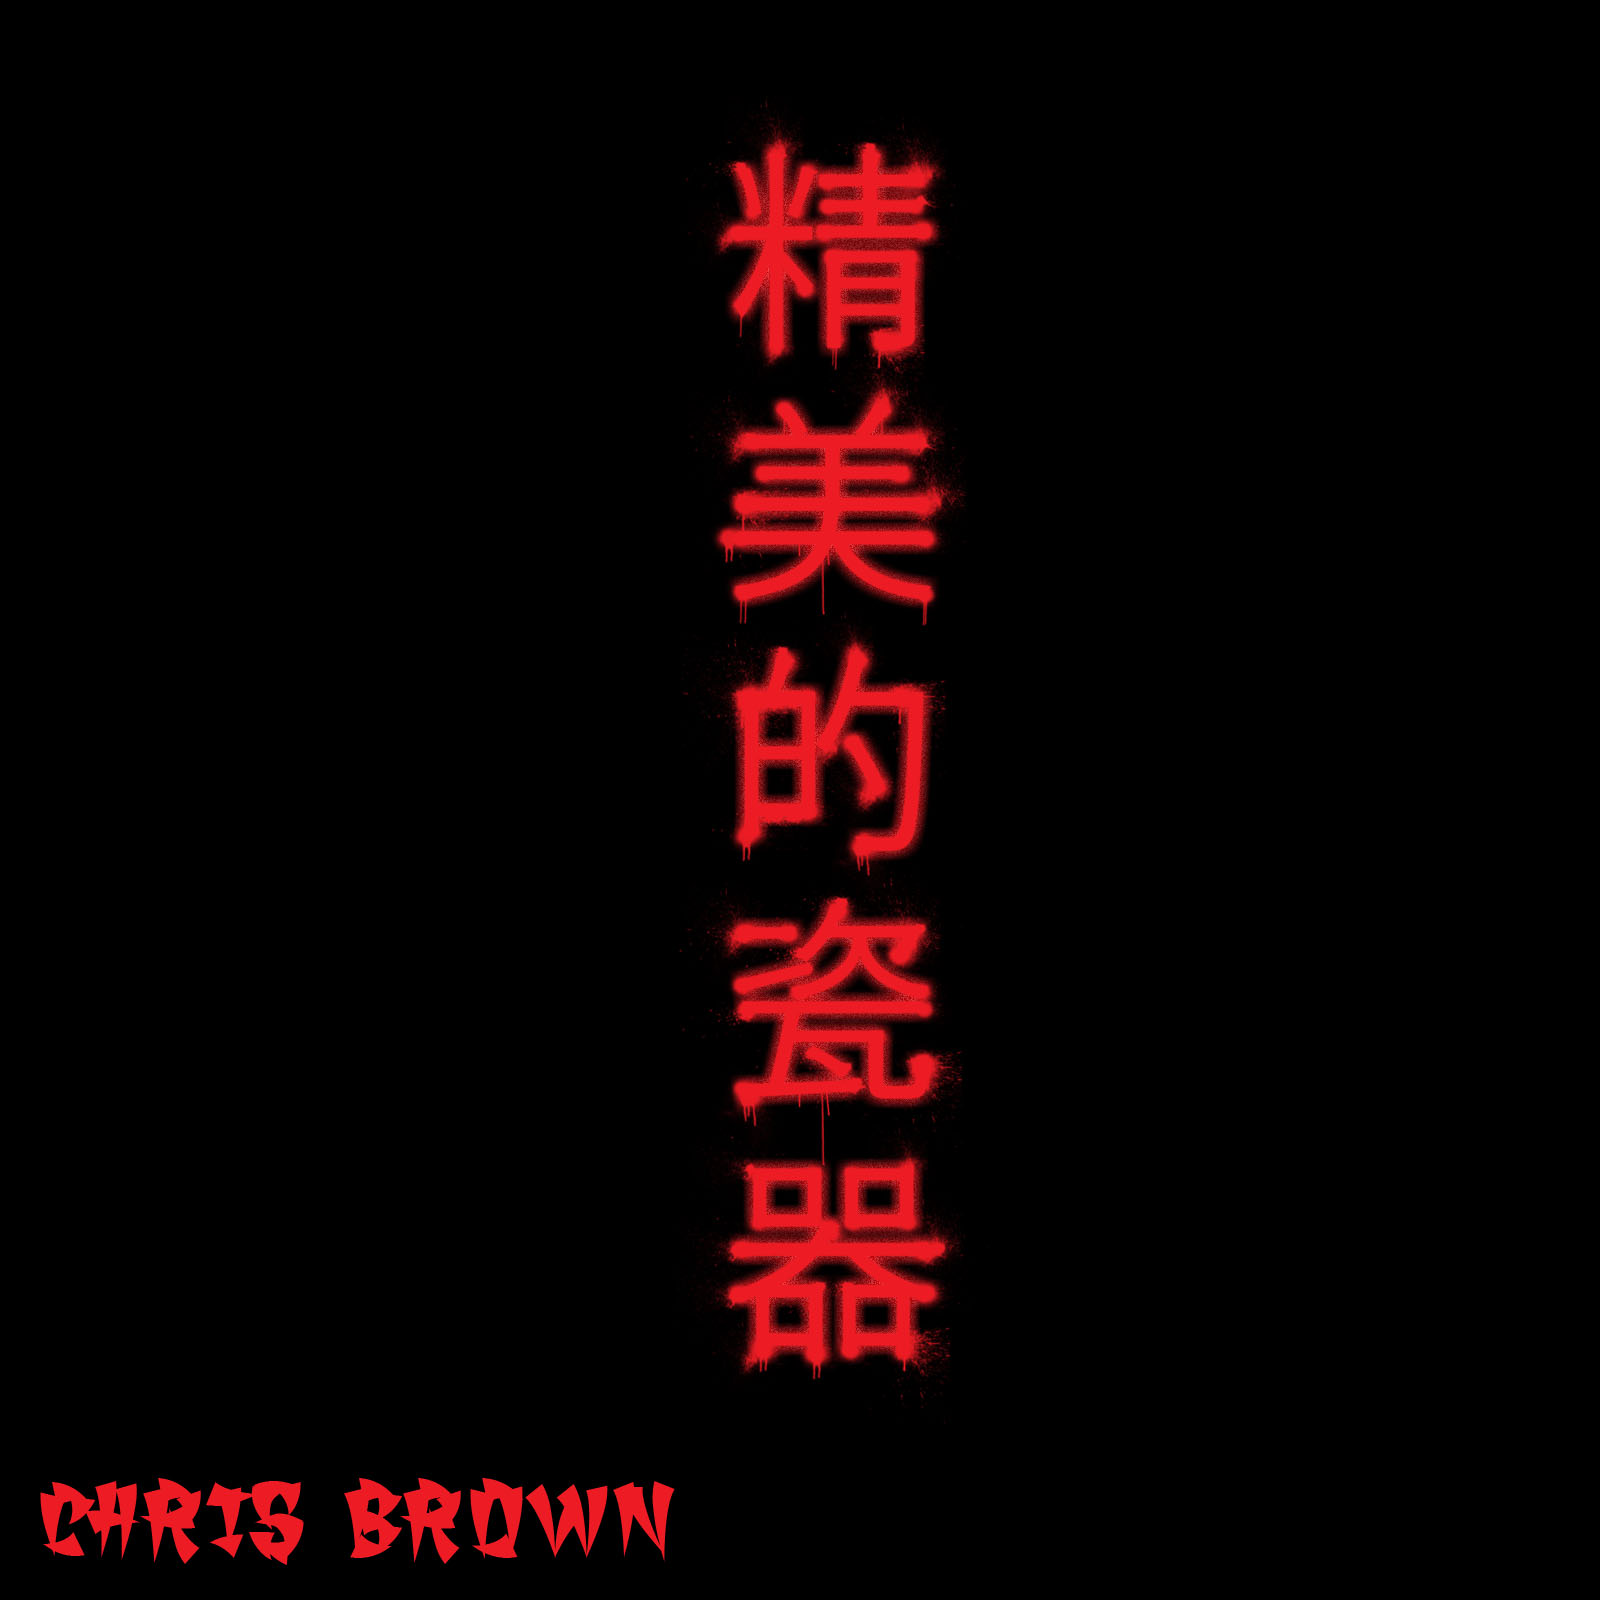 http://3.bp.blogspot.com/-qb60iFiFJYY/UVvnHcJltwI/AAAAAAAAAUs/UIqSkpXs7NI/s1600/Chris+Brown+-+Fine+China.jpg